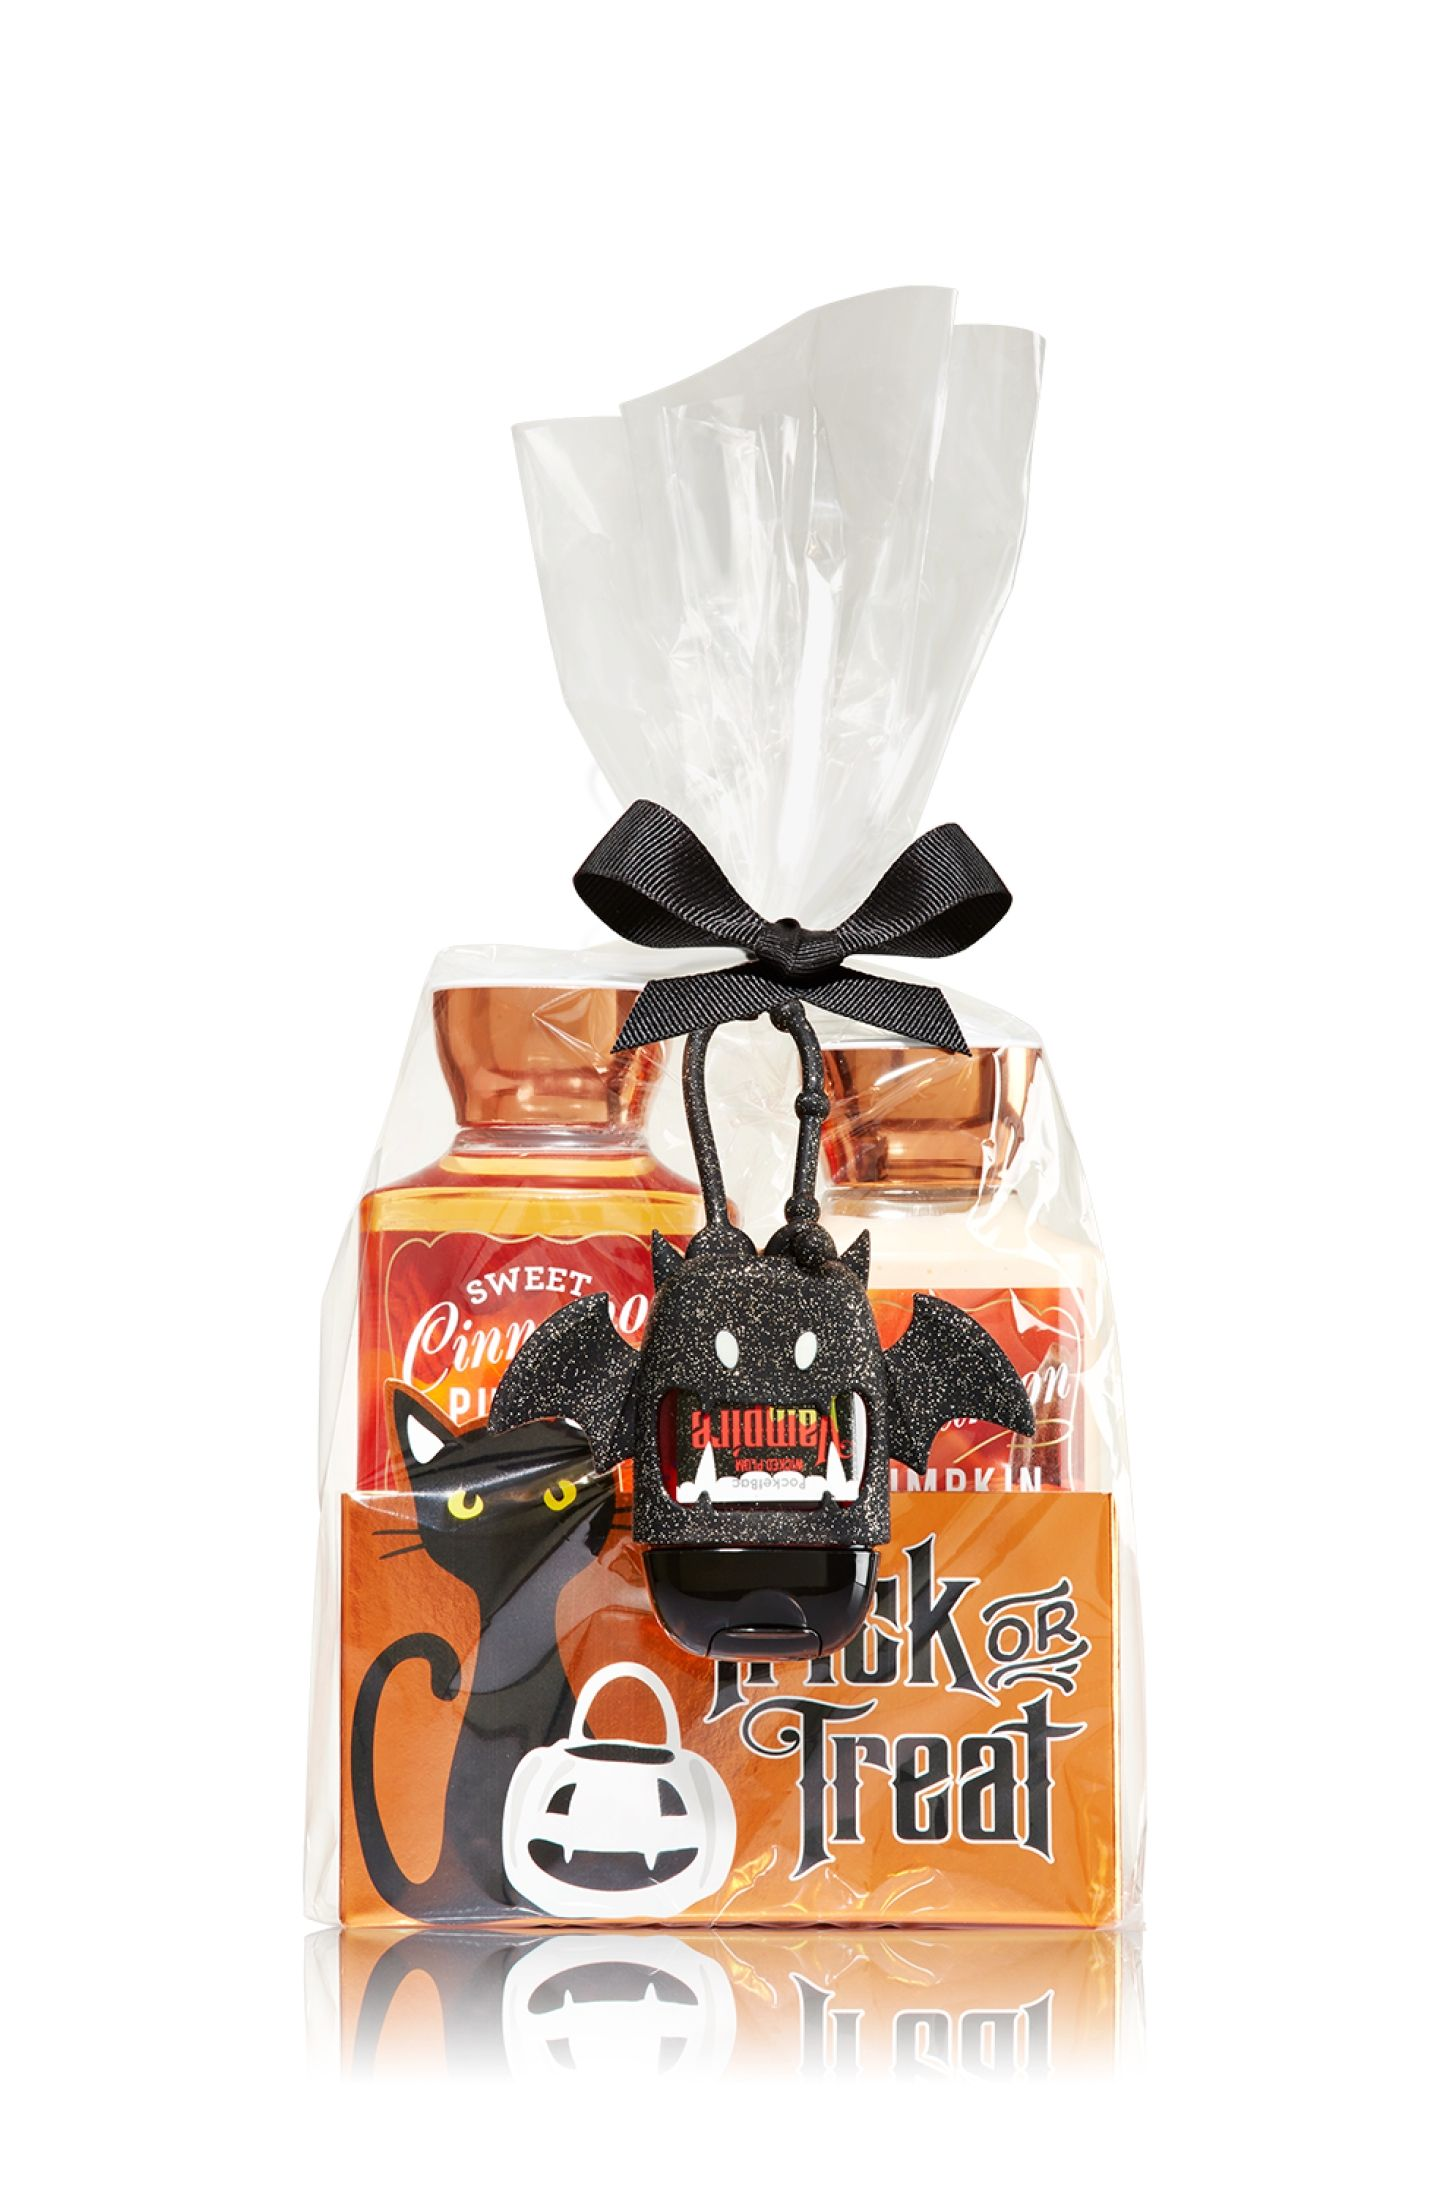 Sweet Cinnamon Pumpkin Trick or Treat Gift Set Signature